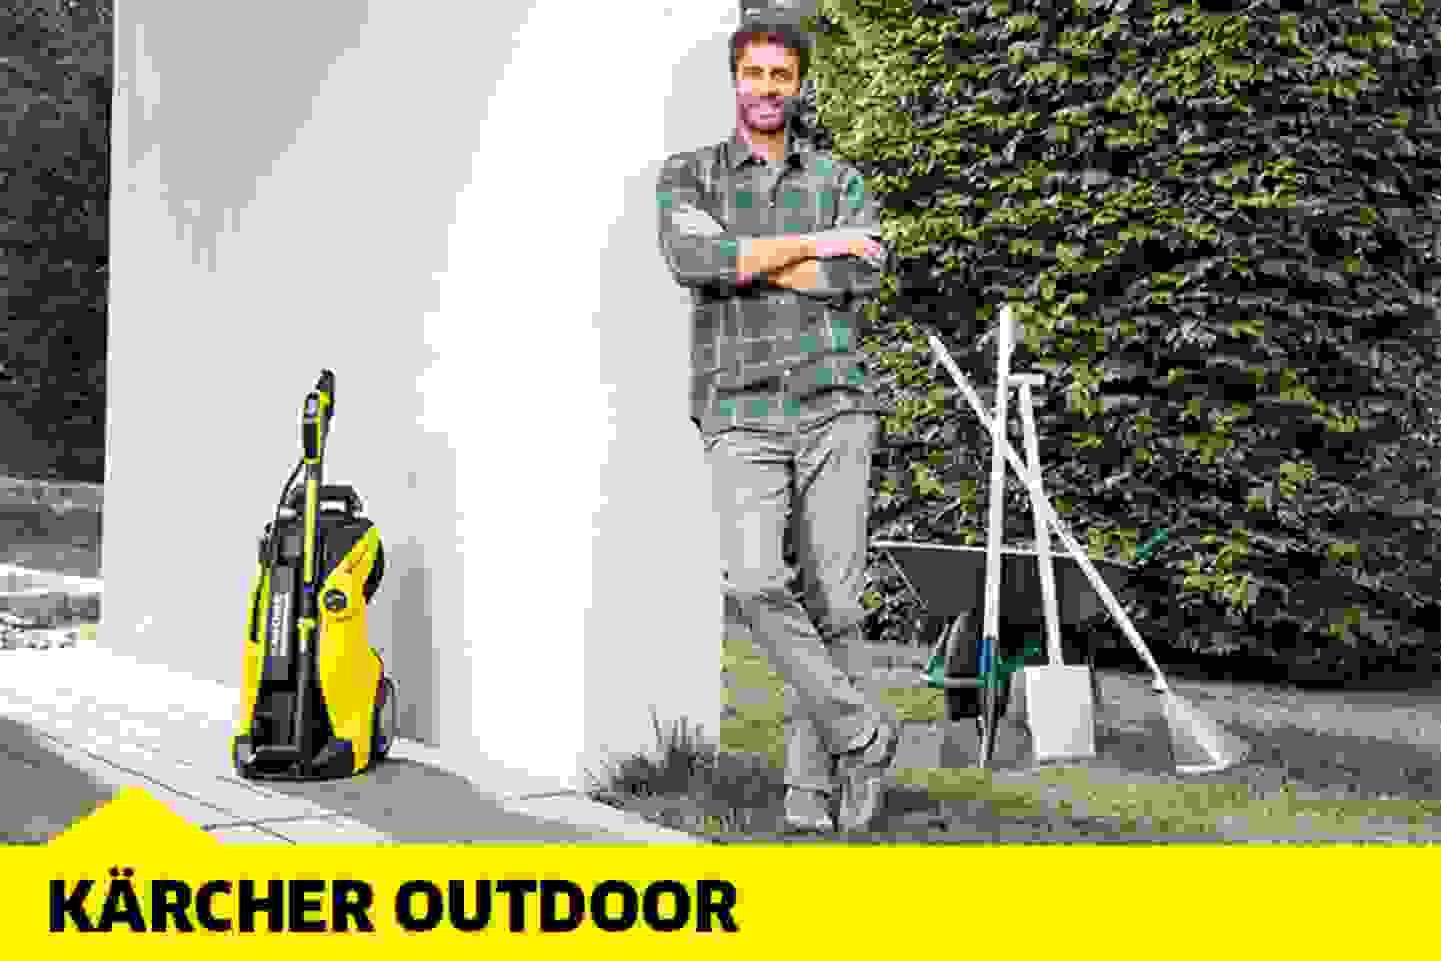 Kärcher Outdoor